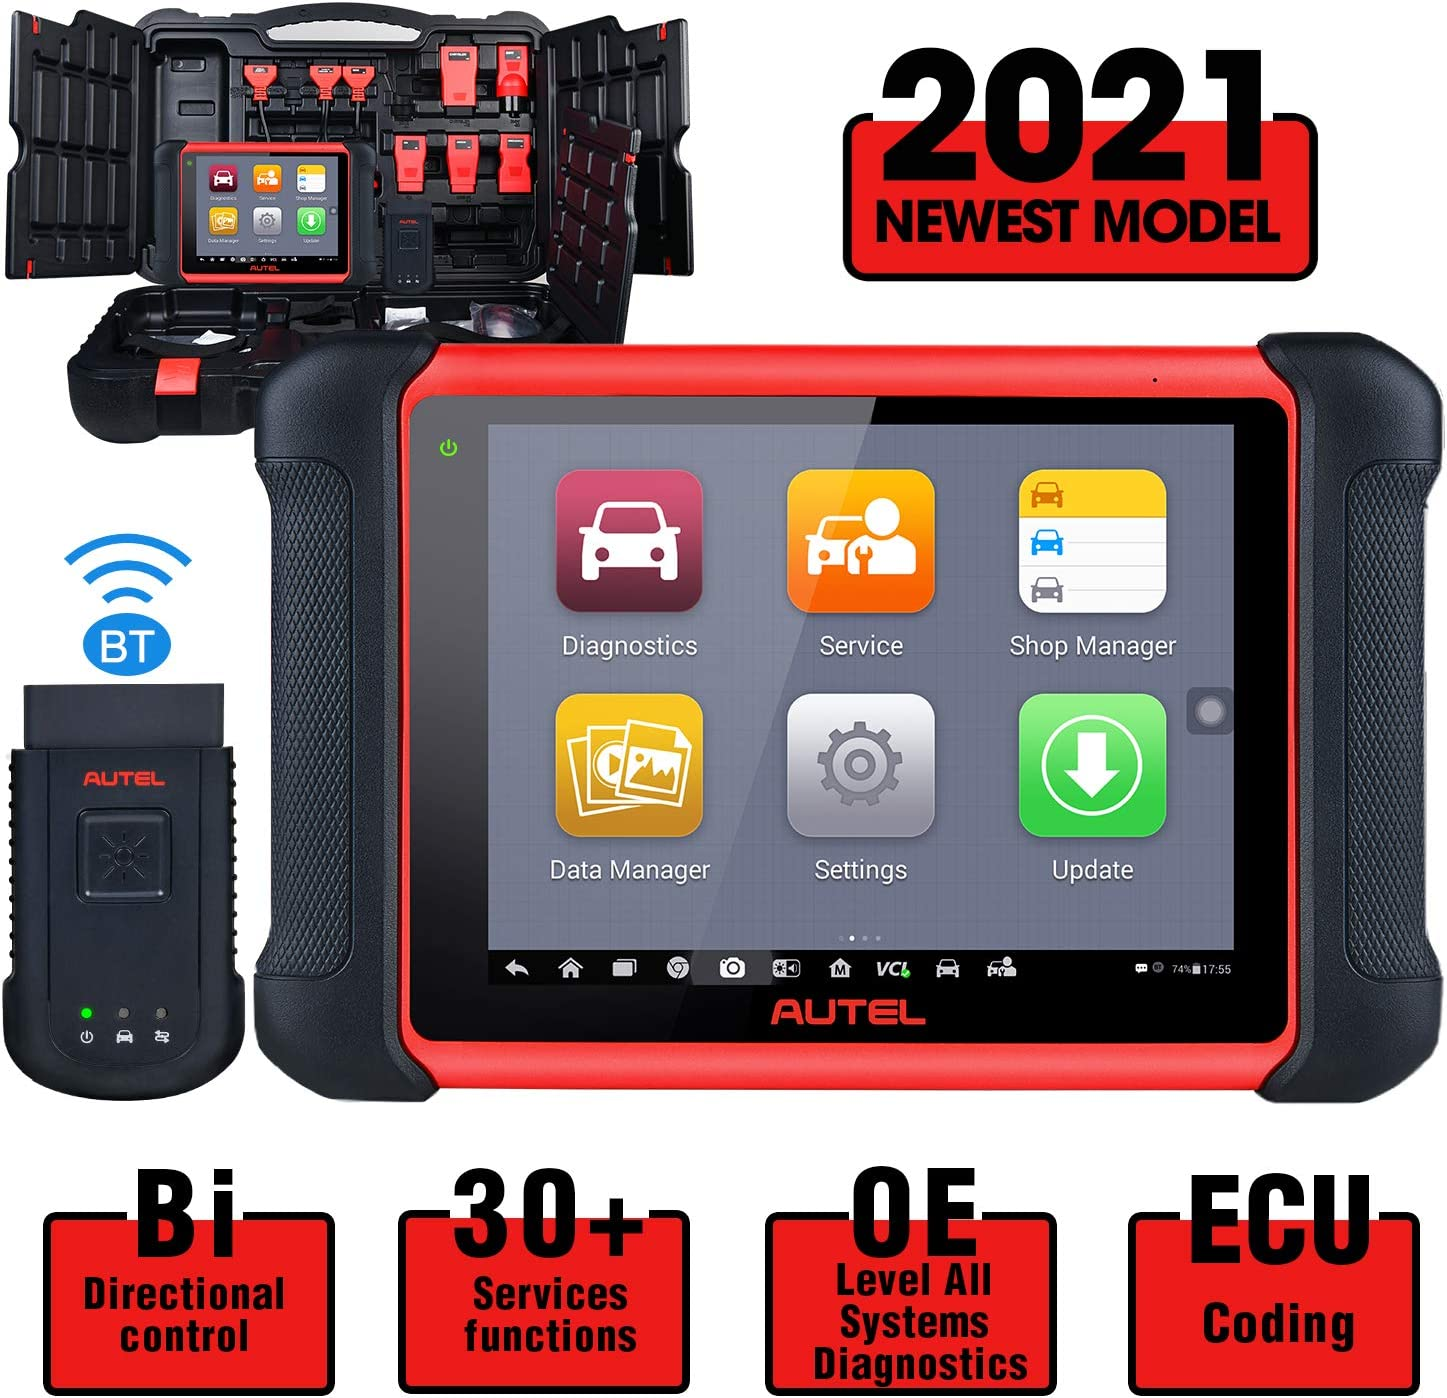 Autel MaxiCOM MK906BT Automotive Scan Tool, 2021 Newest [Same as MS908/MS906BT] All System Diagnostics Scanner, ECU Coding, Bi-Directional Control, 31 Services, ABS Bleed, EPB, Transmission